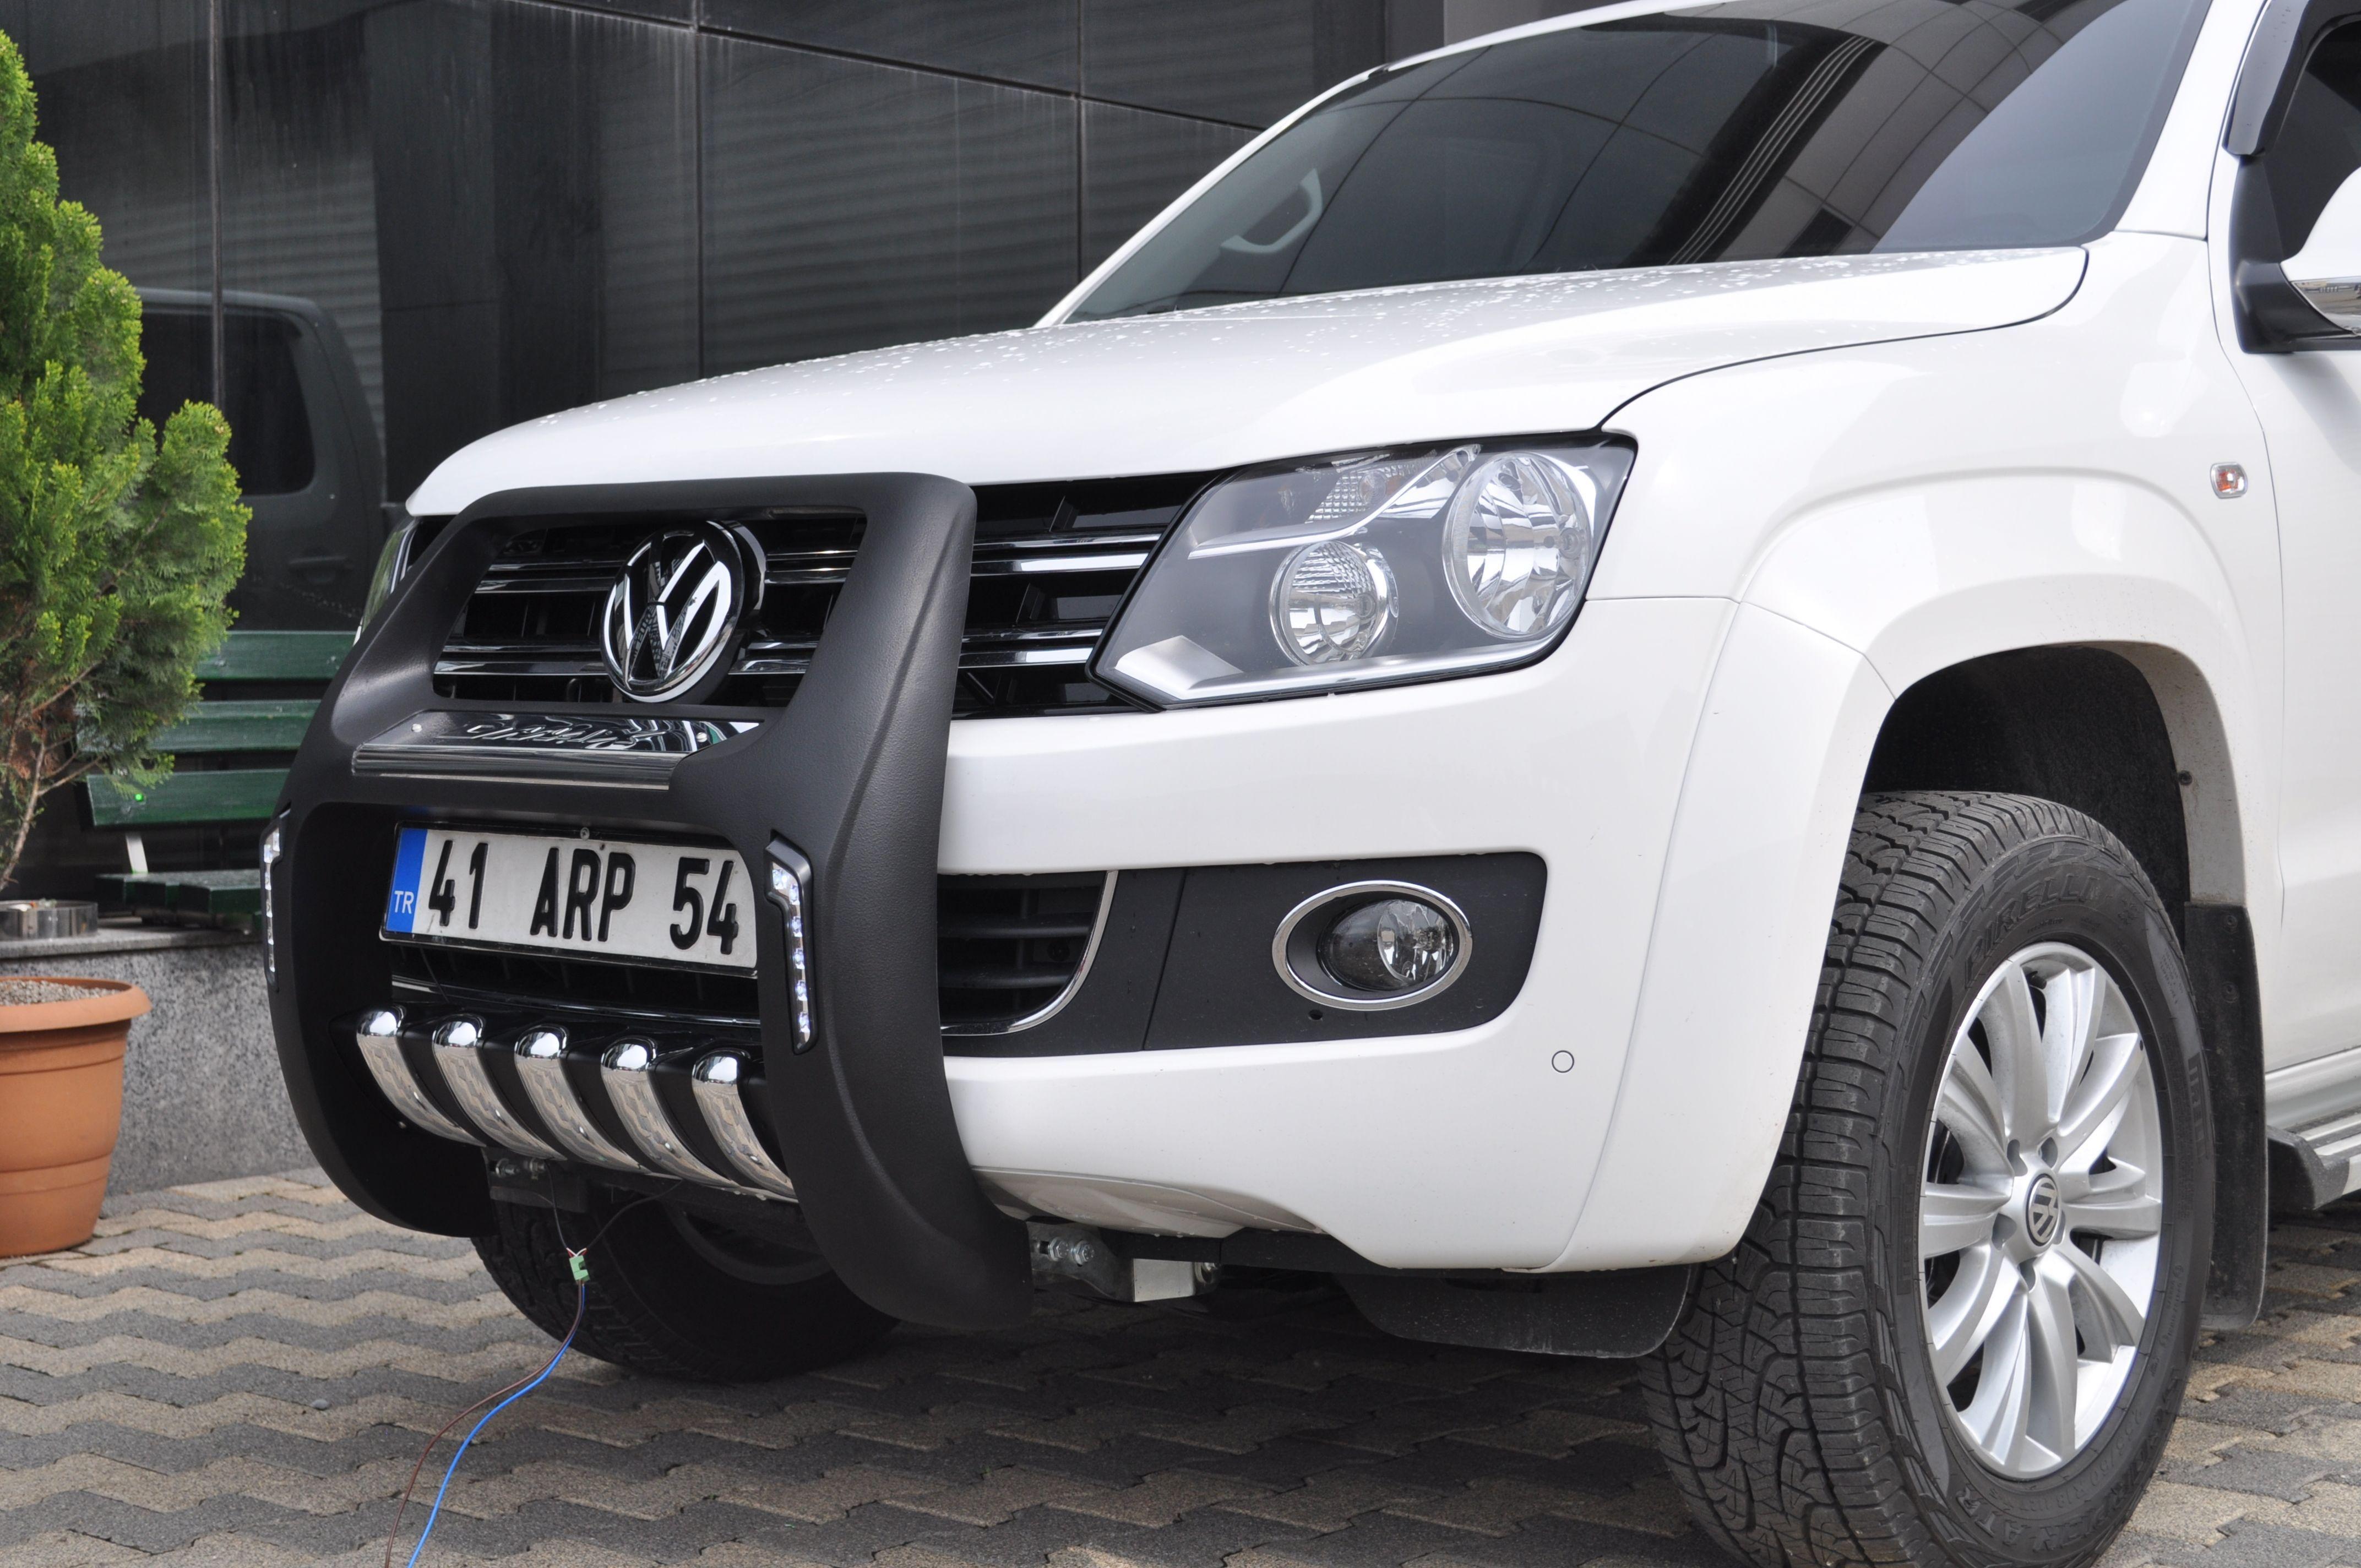 Bullbar Volkswagen Amarok, Bara de protectie Vw Amarok